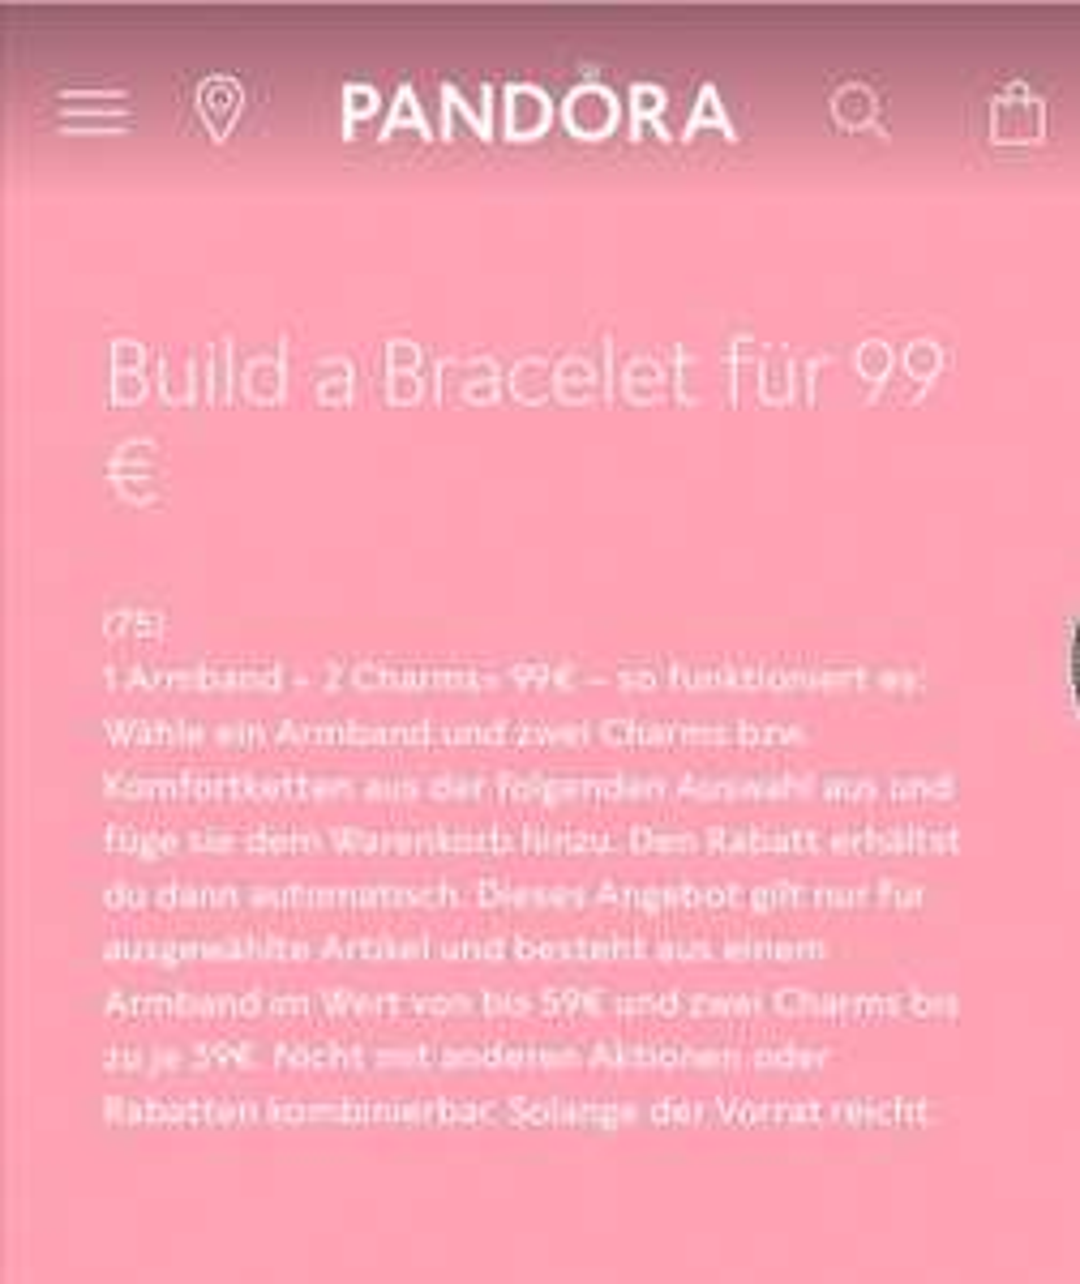 Pandora Armband + 2 Charms für 99€